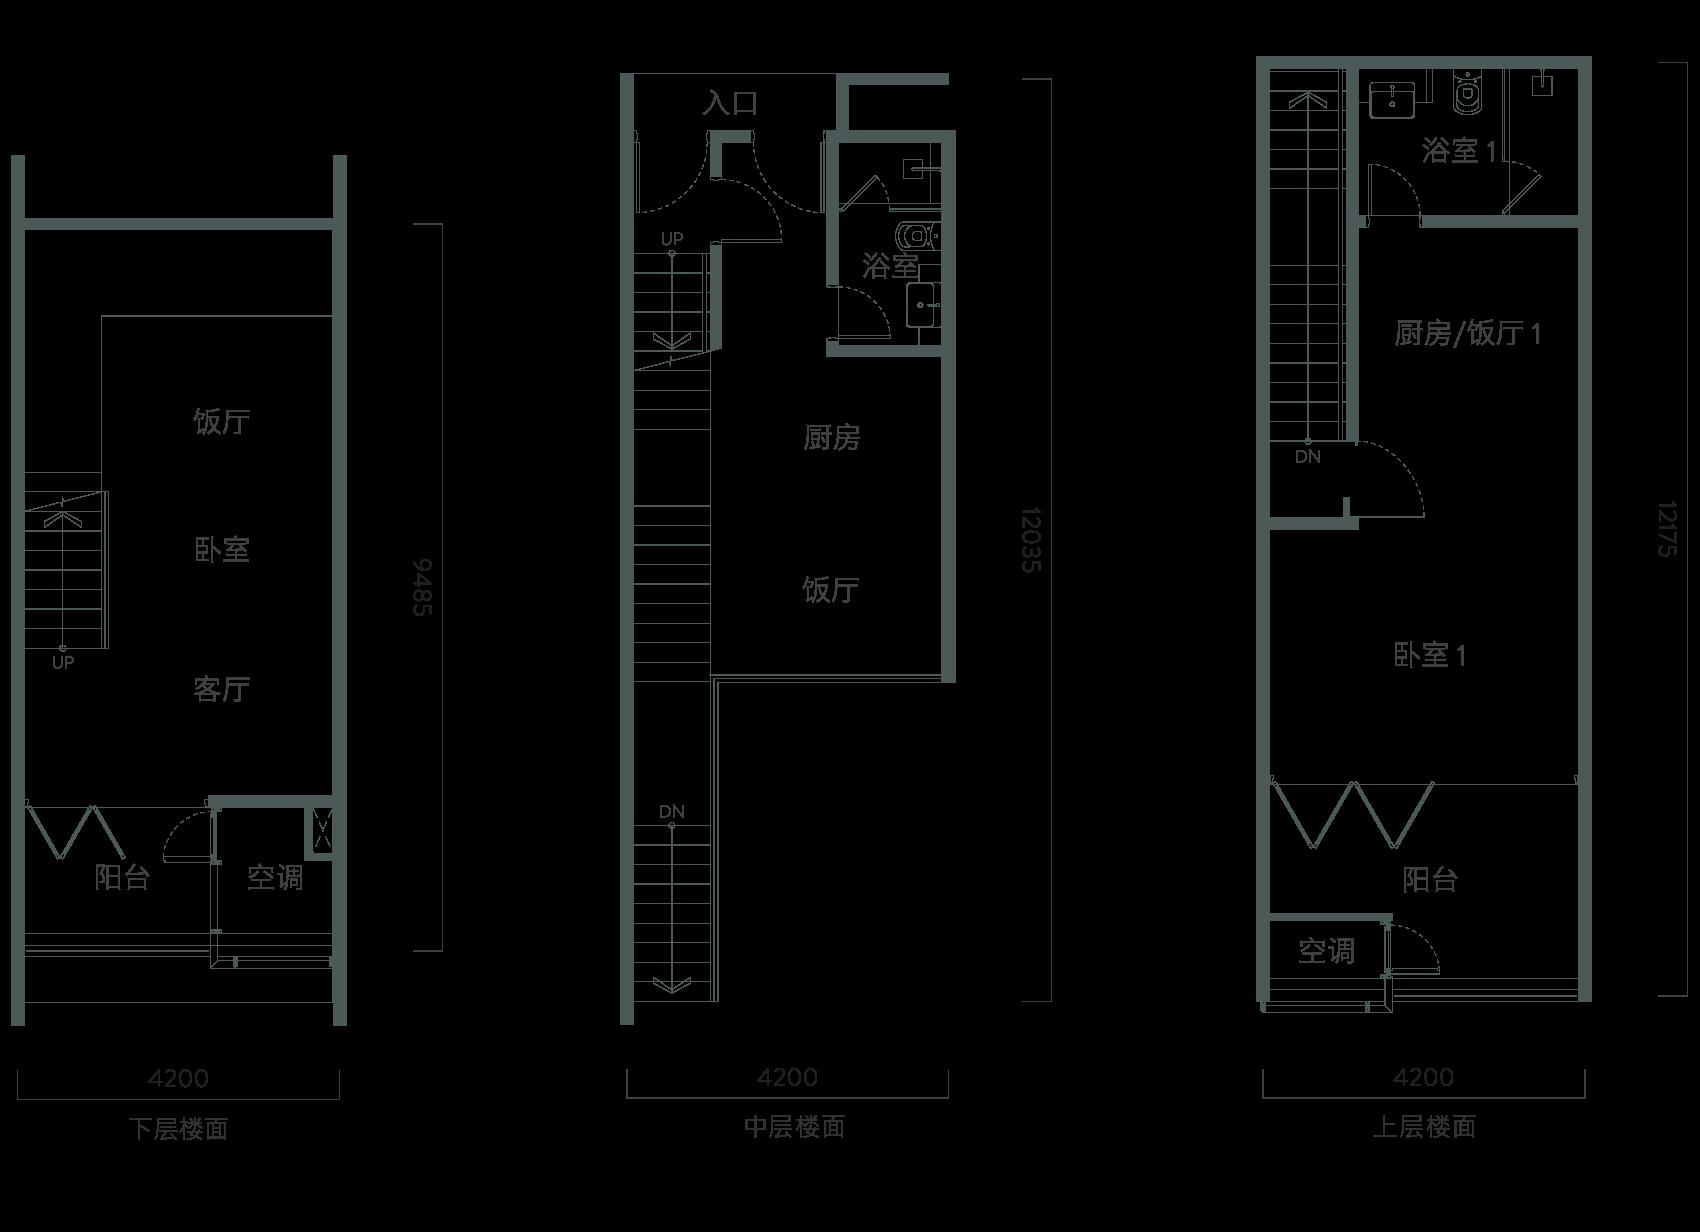 TS3a(M) Floorplan